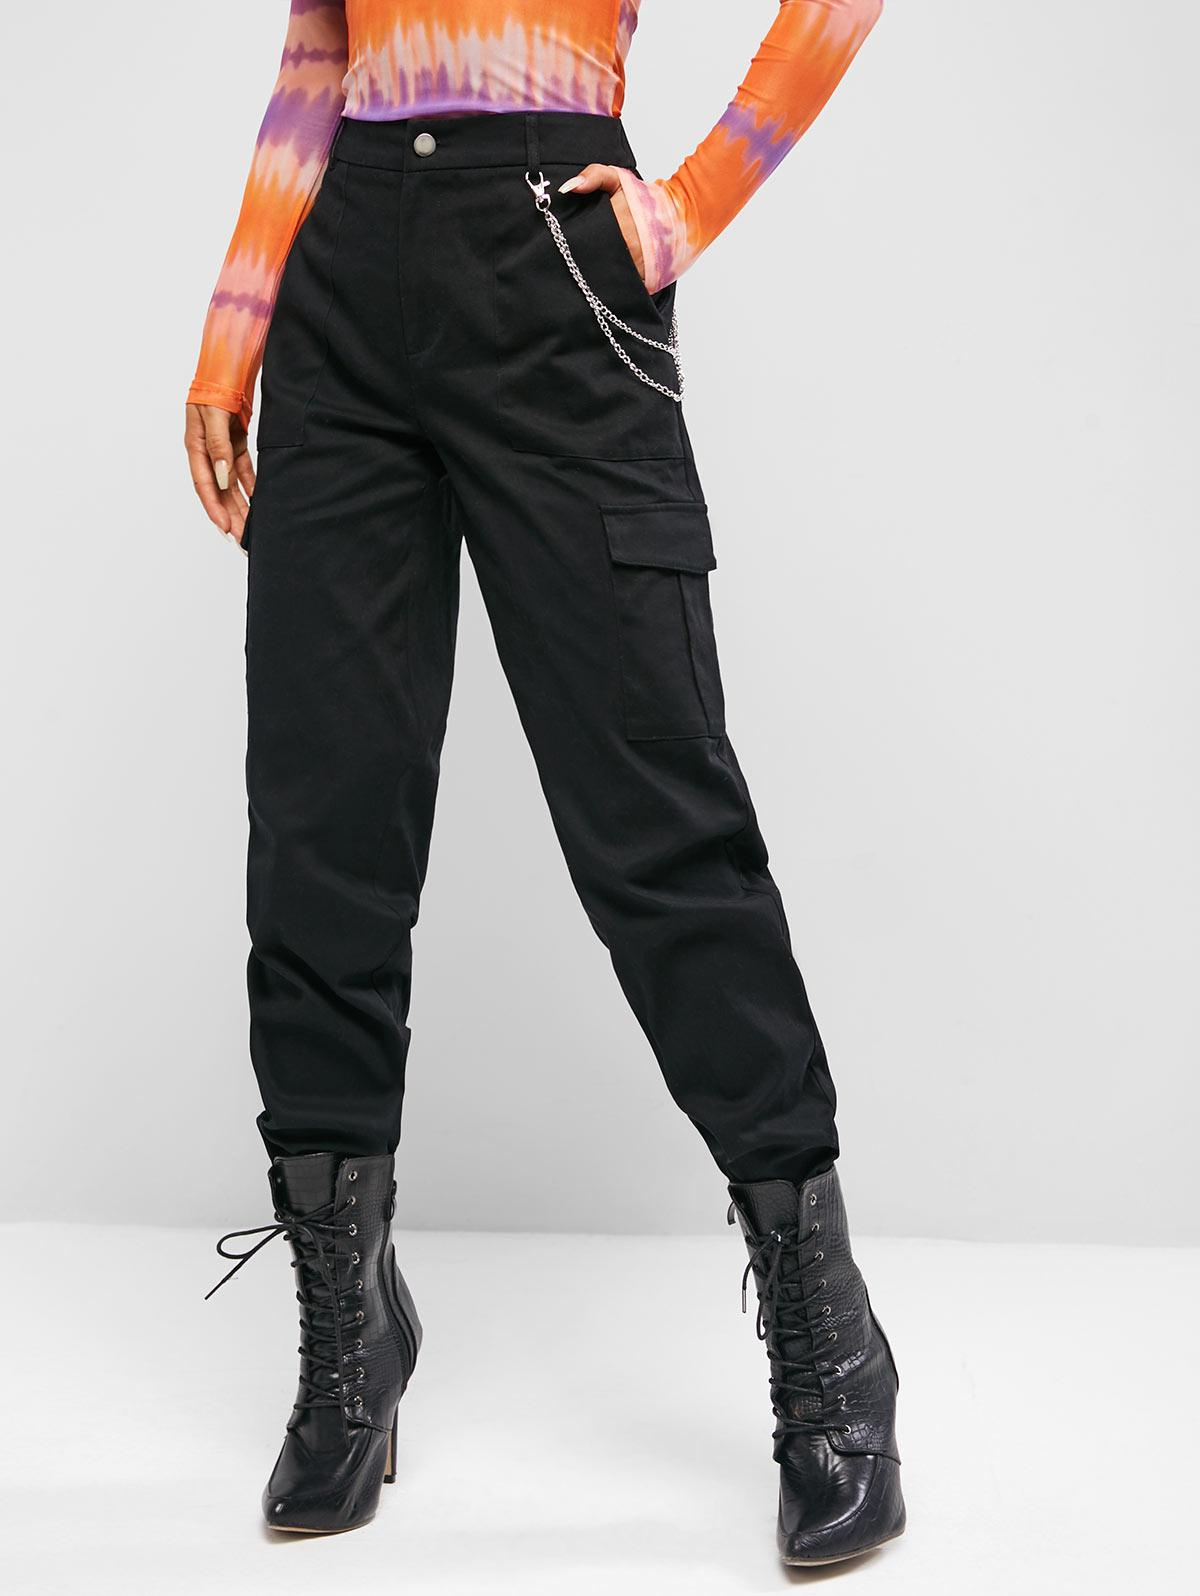 Pantalon Cargo à Taille Haute avec Chaîne - ZAFUL - Modalova